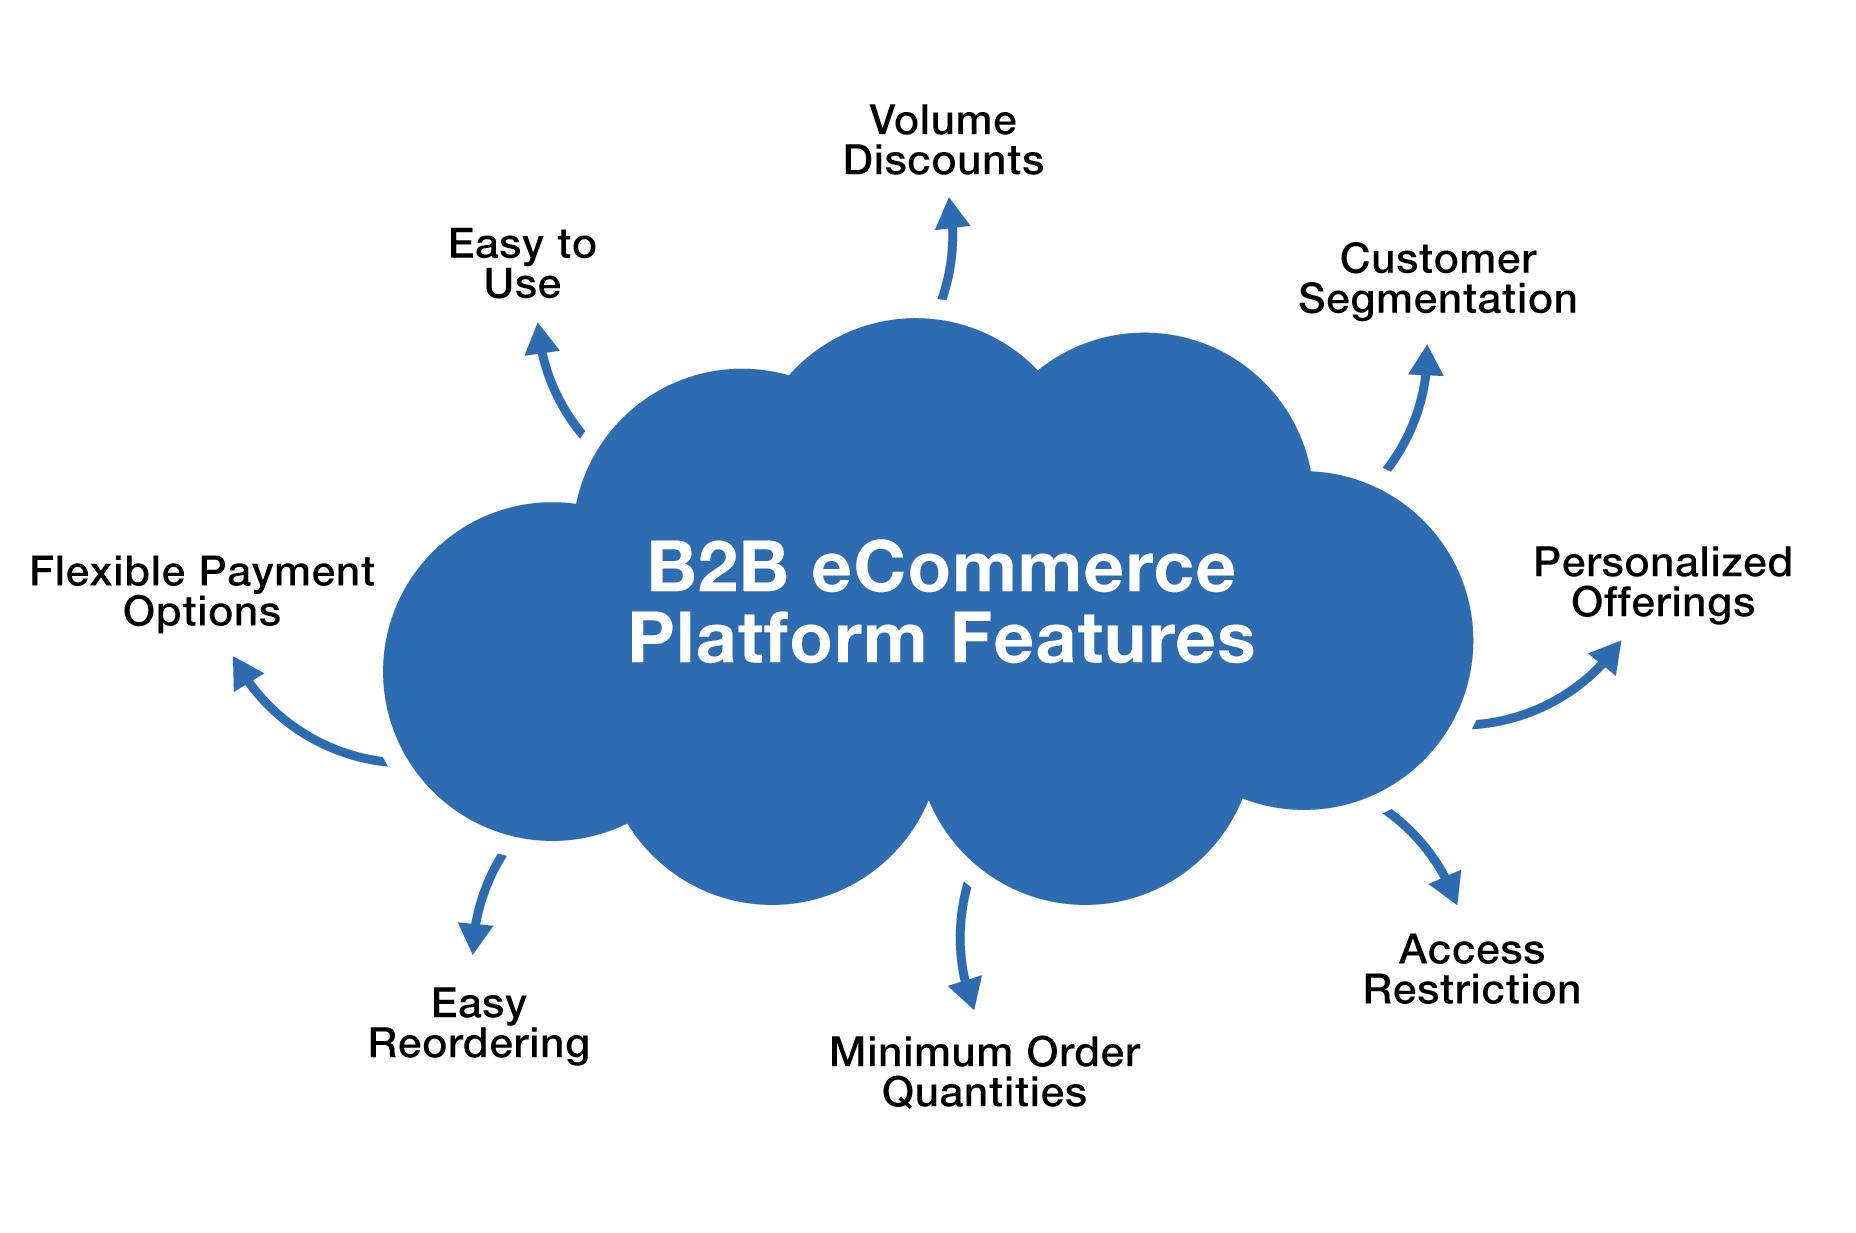 B2B eCommerce Platform Features